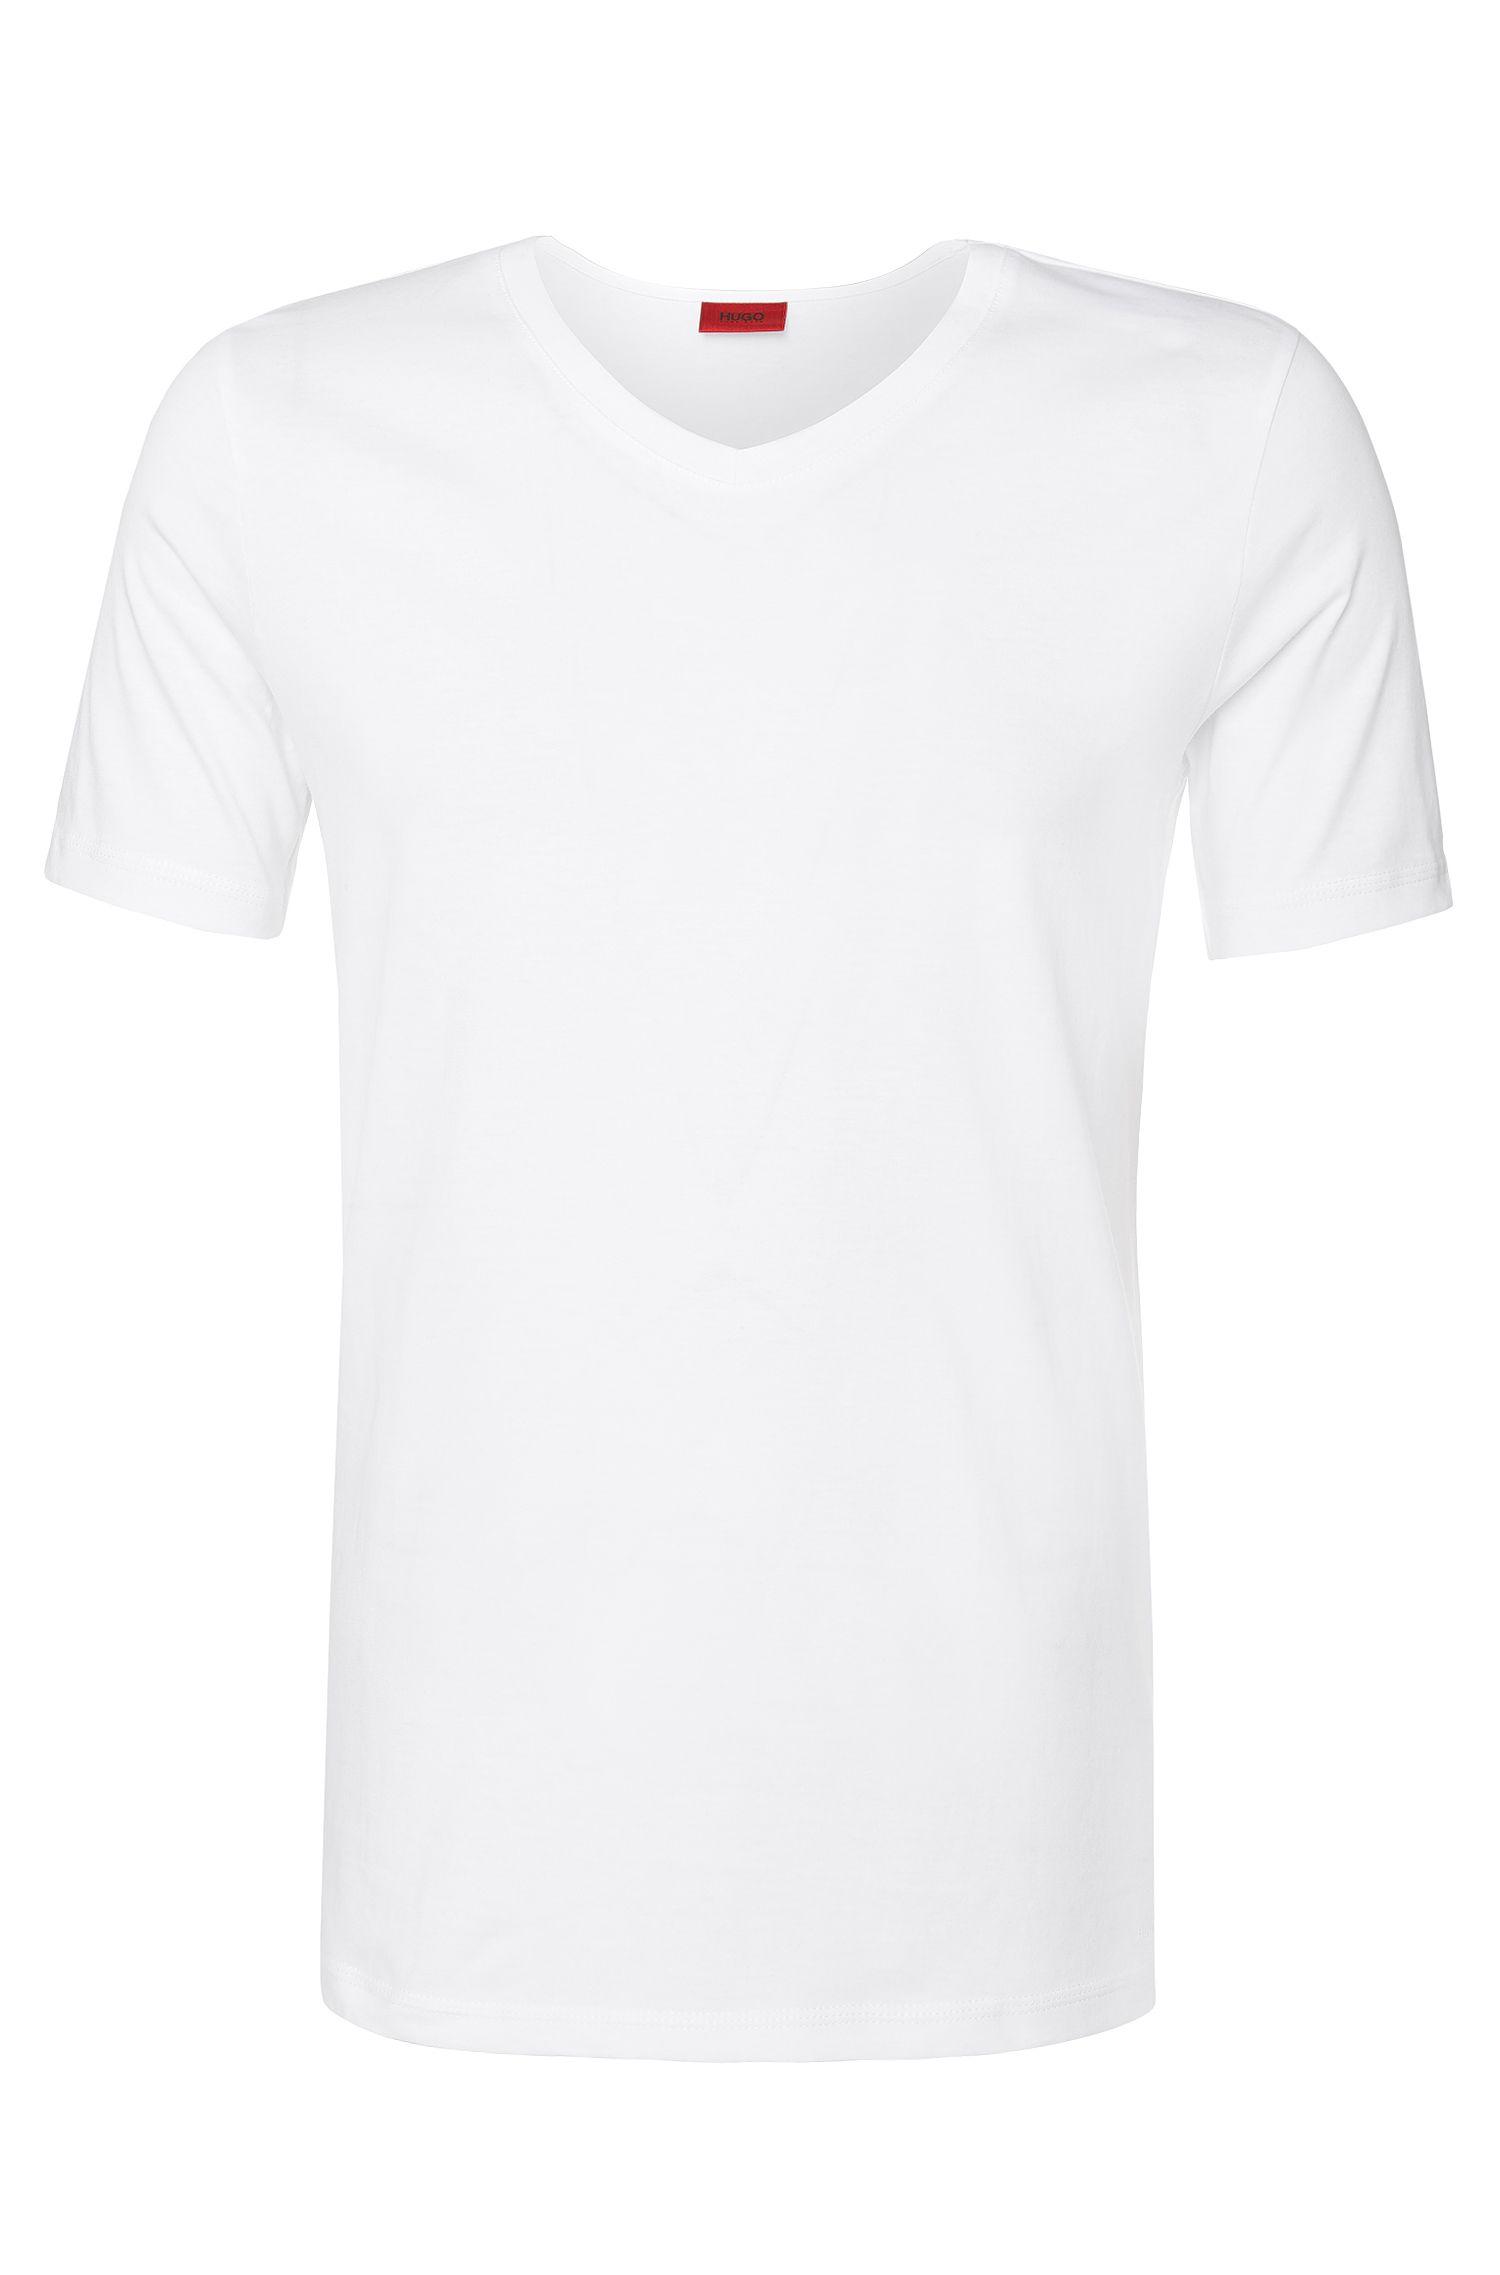 'Danny' | Cotton V-Neck T-Shirt